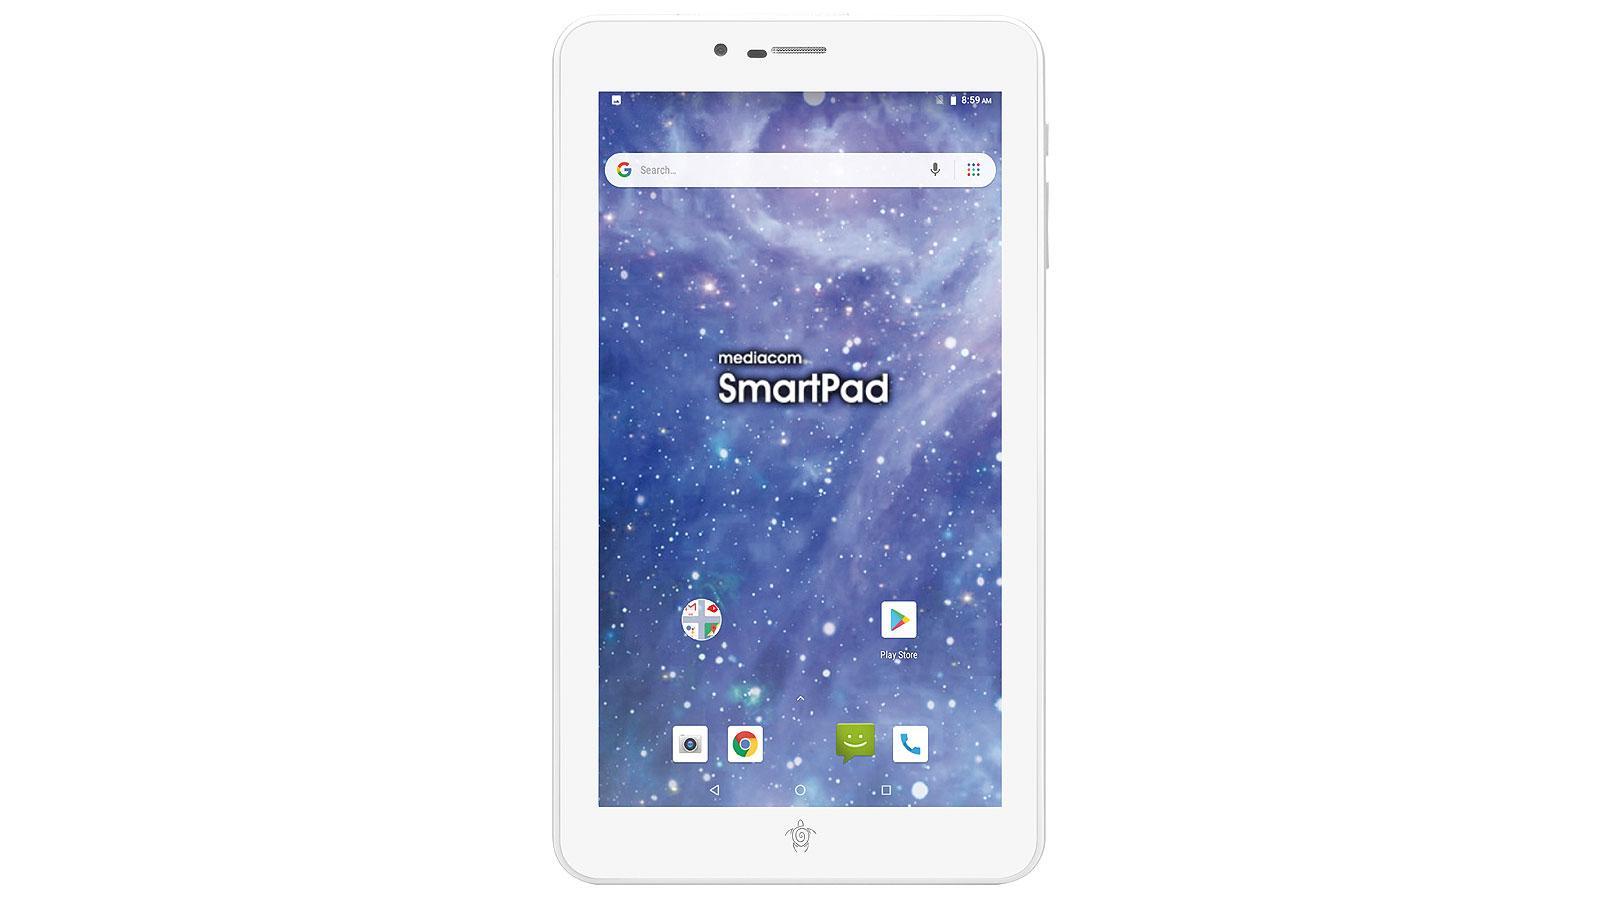 Mediacom SmartPad iyo 7 3G 16 GB 17,8 cm (7